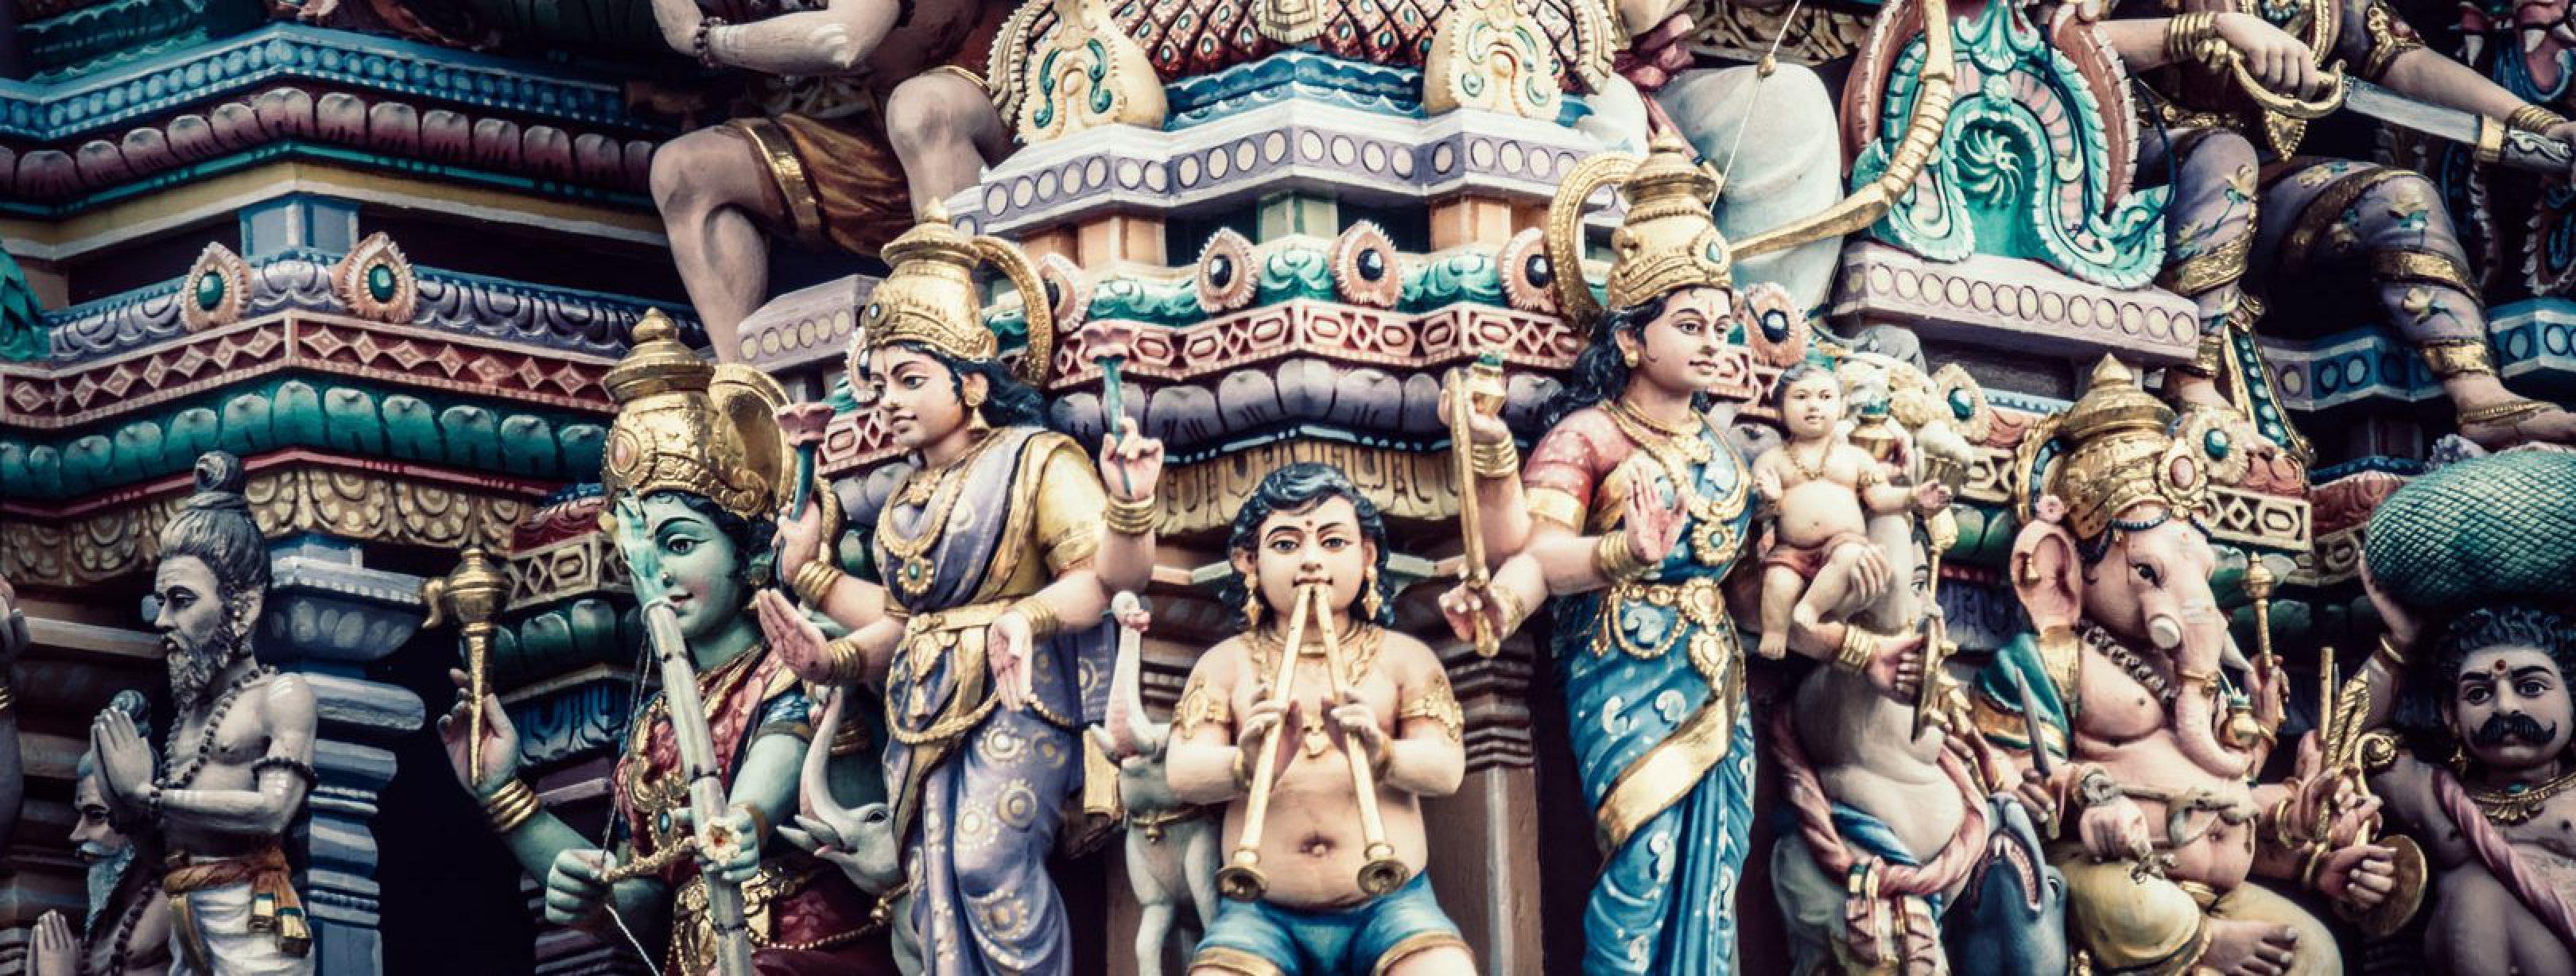 Uitsprake Boeddha Brahmaan